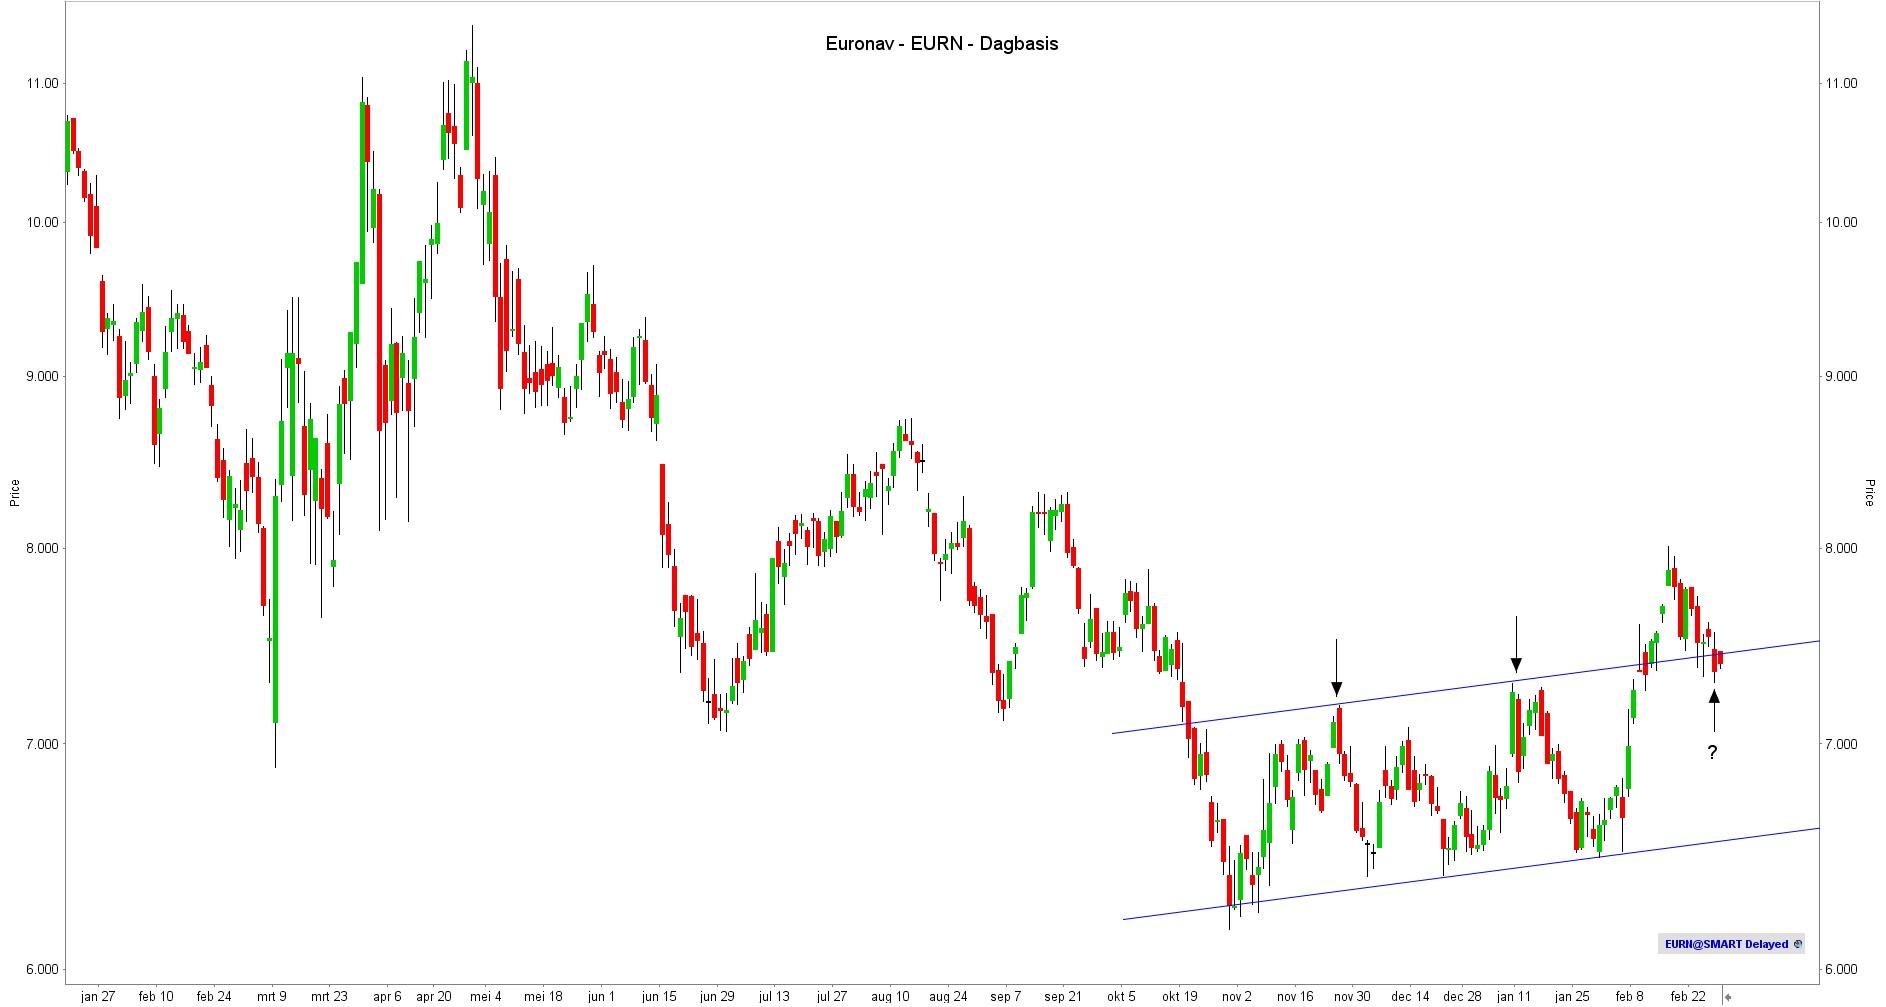 aandeel euronav dagbasis